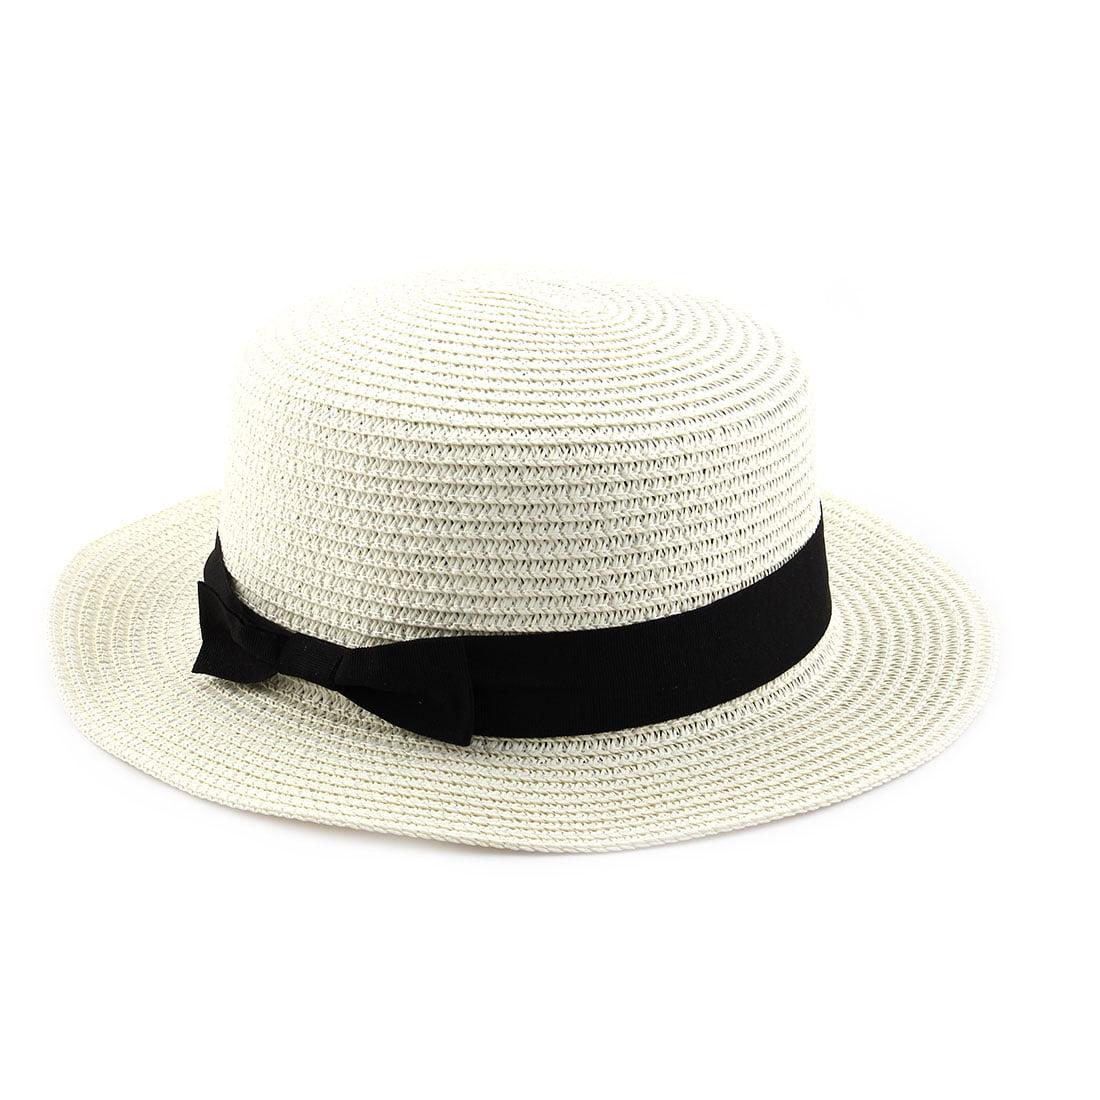 bbad5b611ed Woman Ribbon Decor Wide Brim Braided Summer Beach Straw Cap Sun Hat Off  White